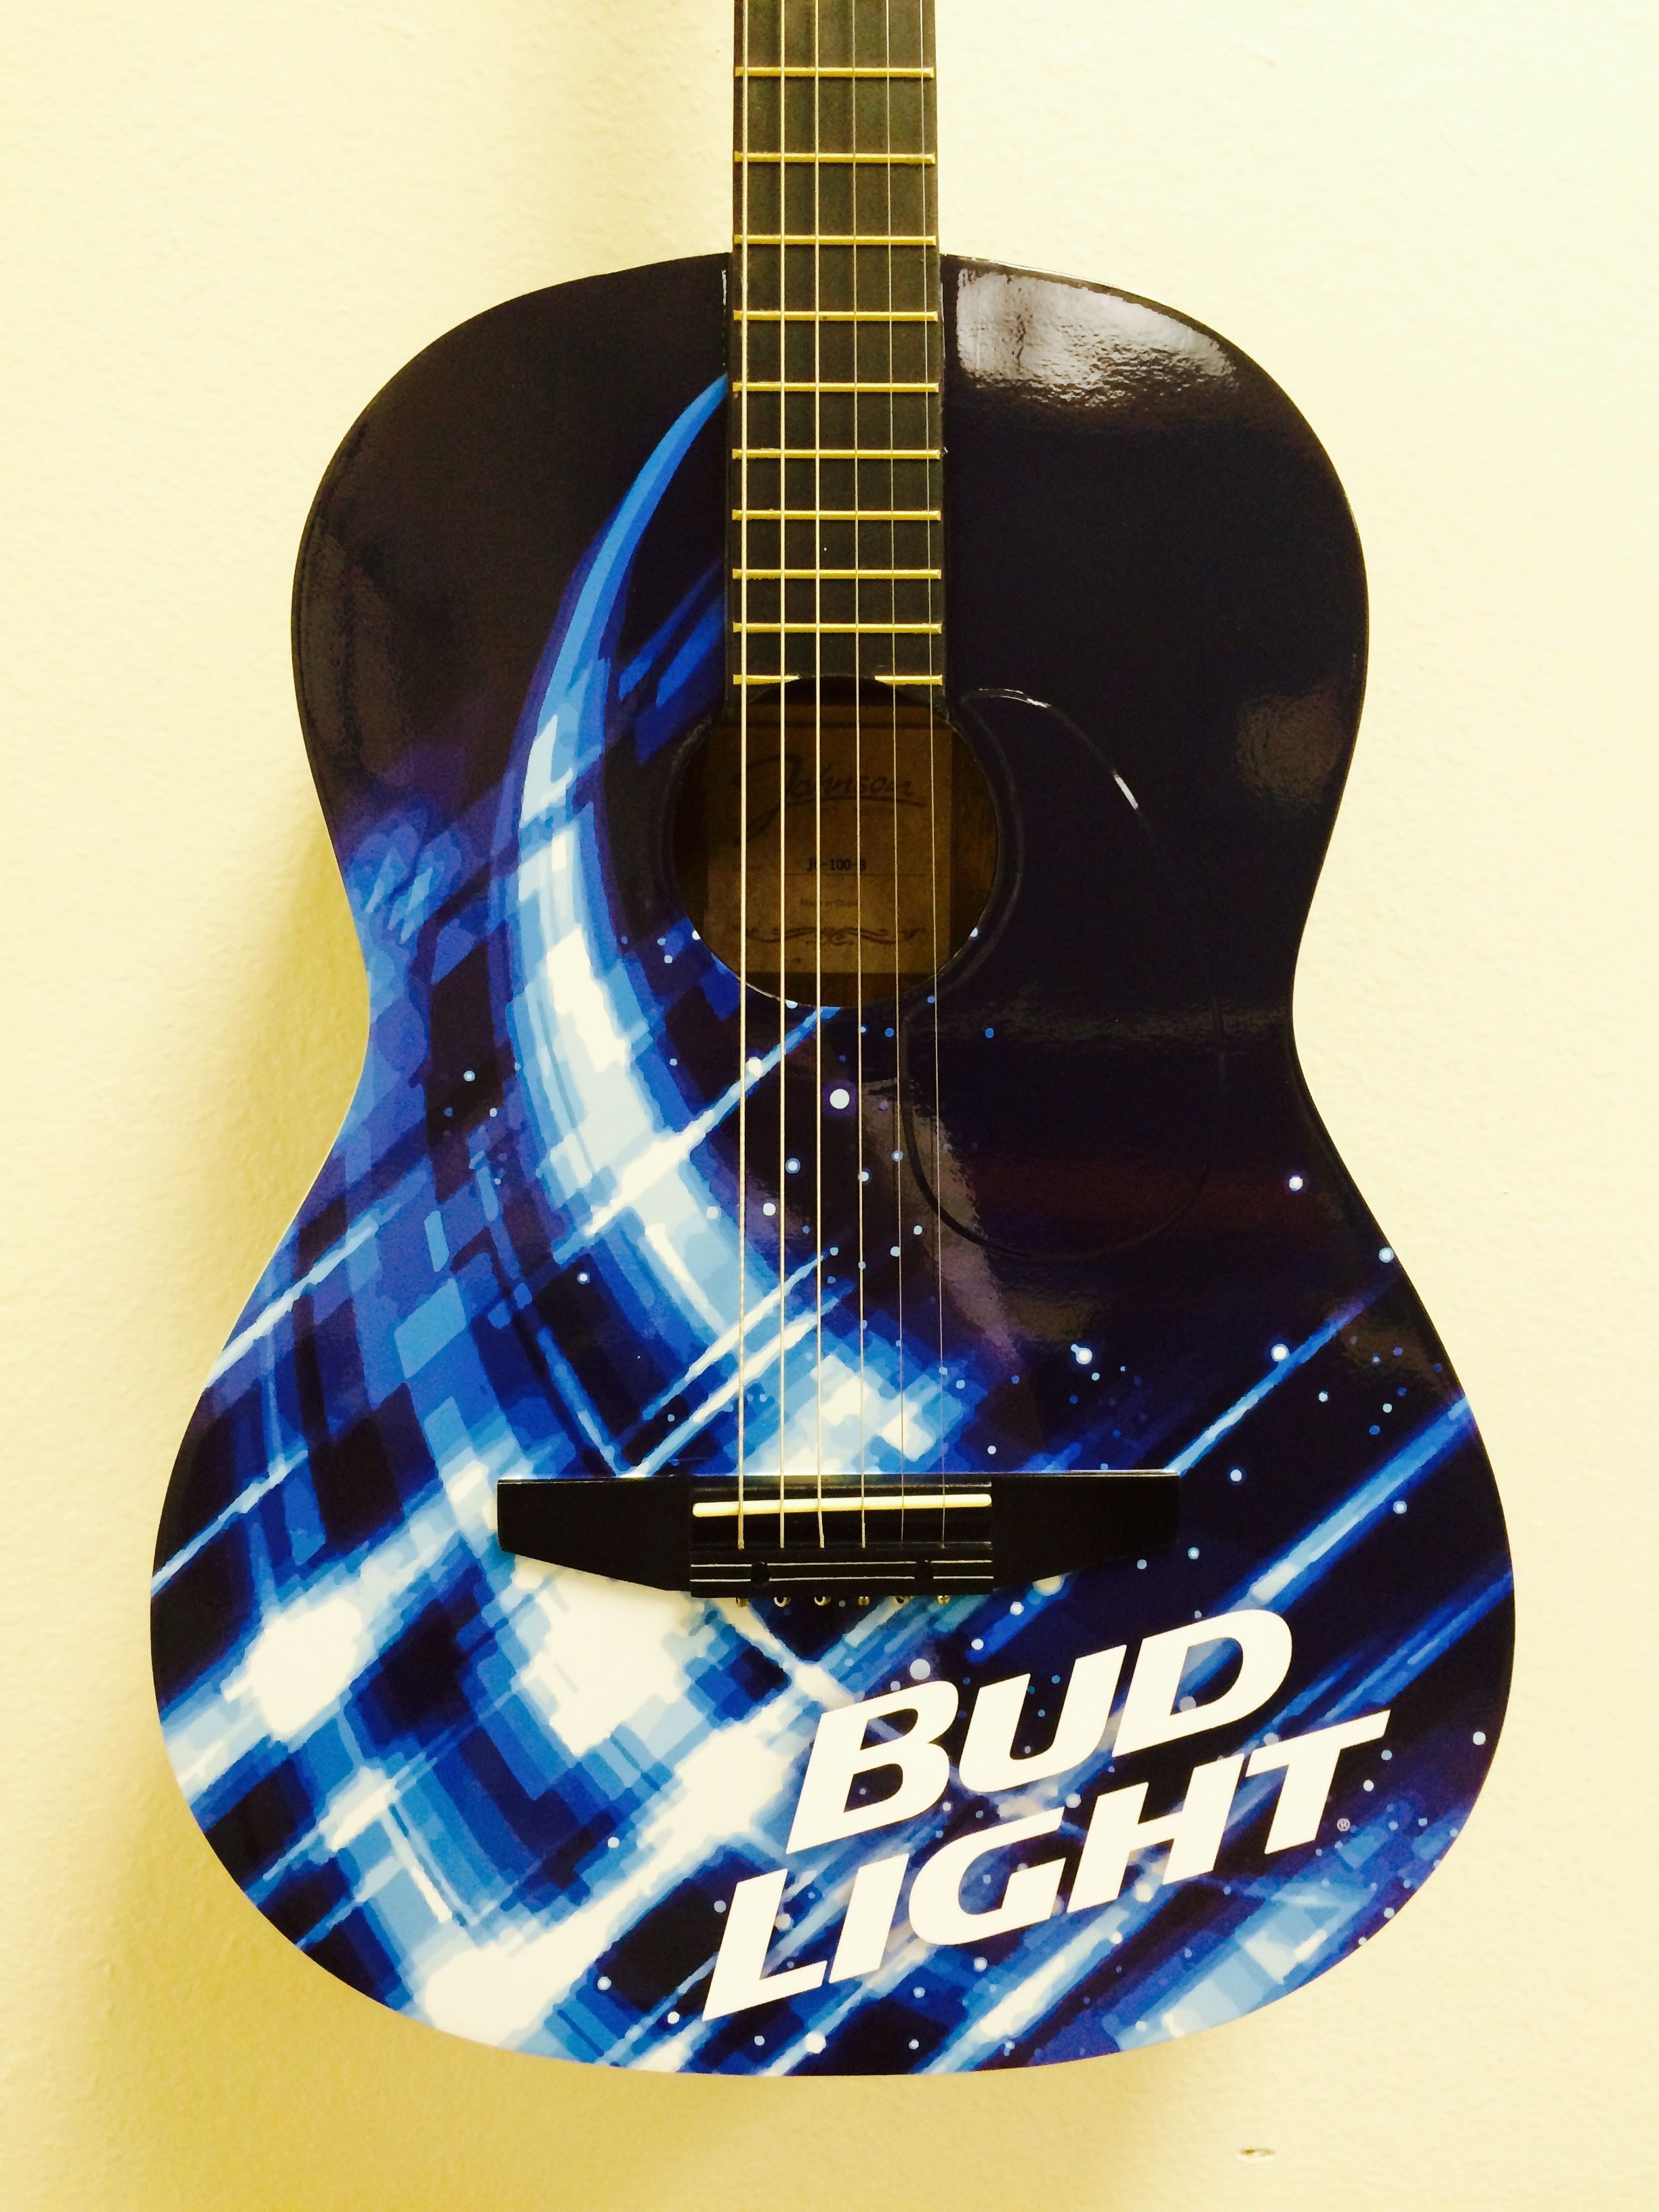 Custom Bud Light wrapped promotional guitars by Brand O